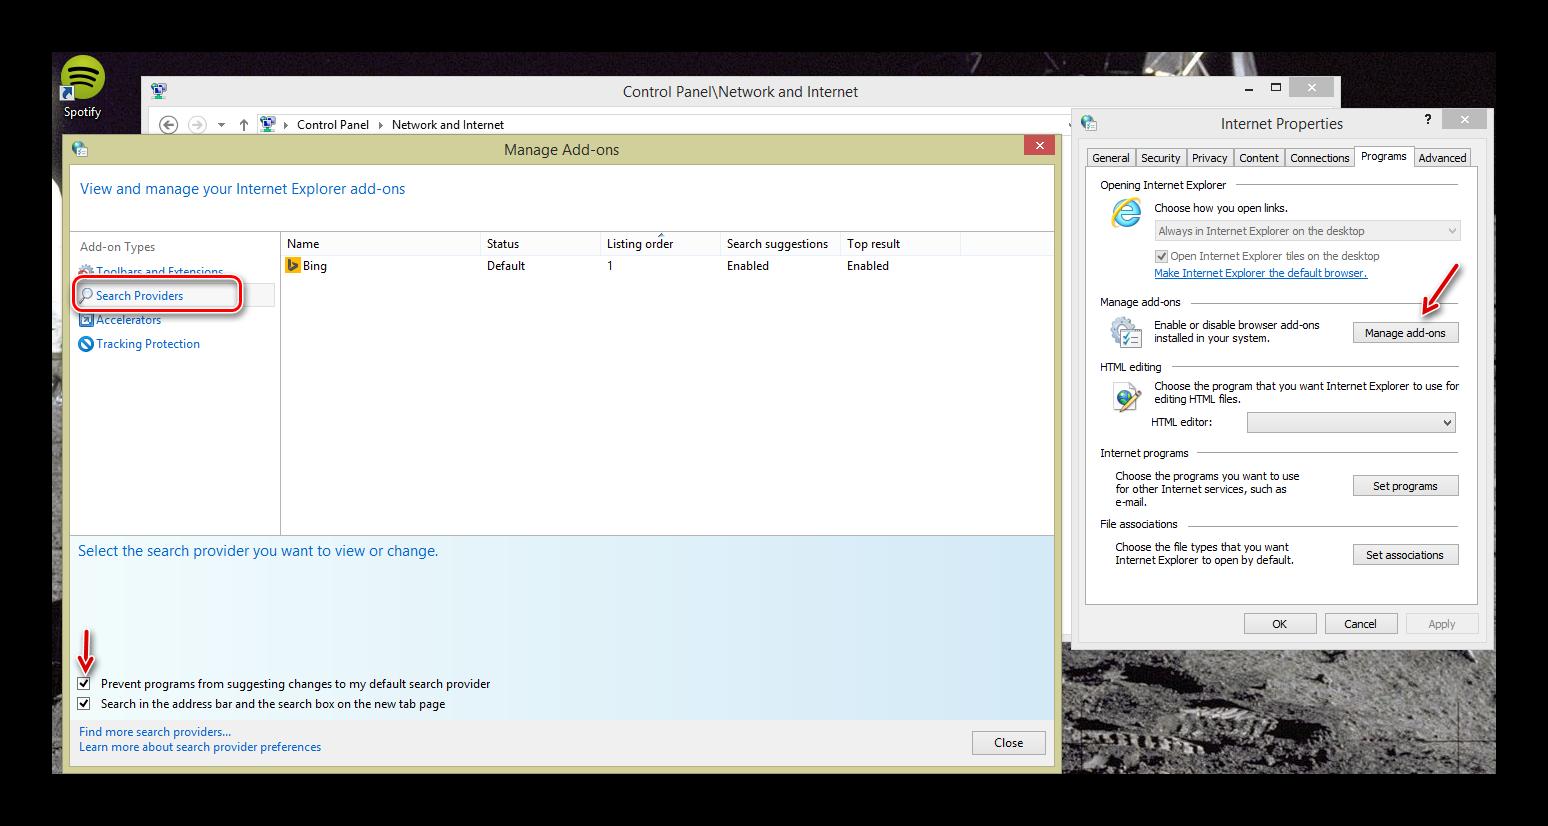 Как назначить Chrome браузером по умолчанию - Android. - Google Chrome 72